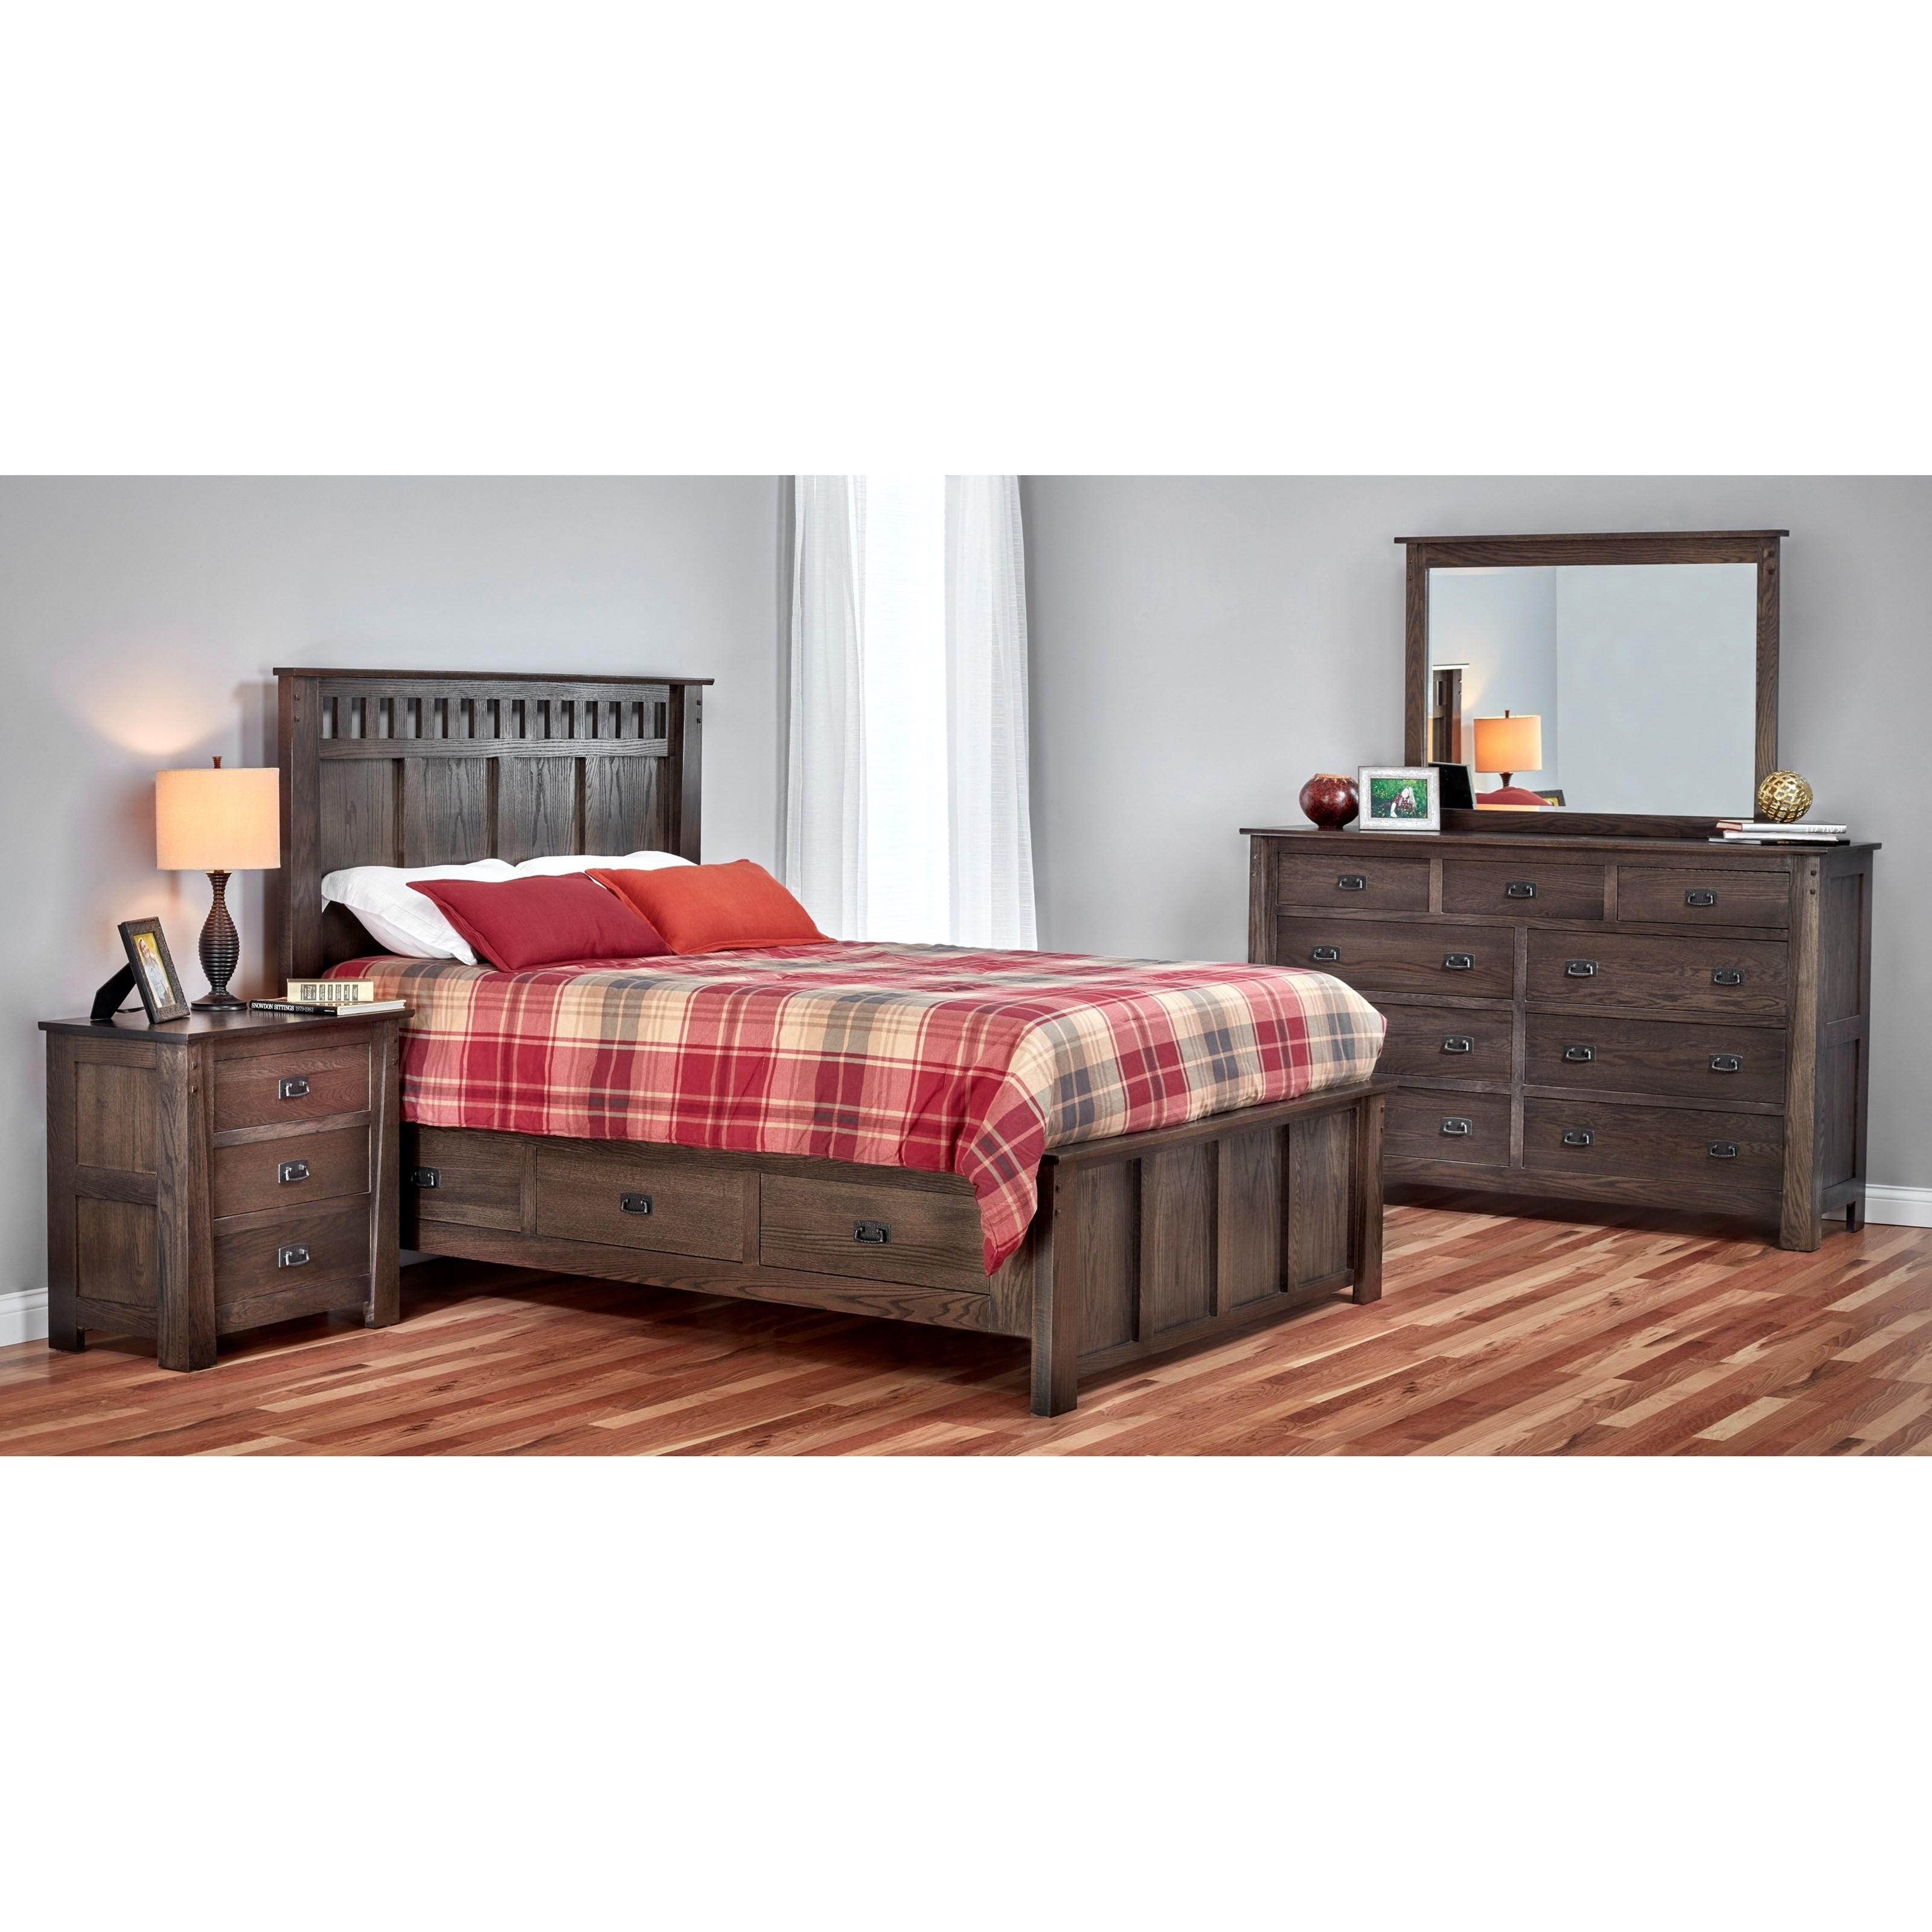 Kennan King Bedroom Group by Witmer Furniture at Mueller Furniture